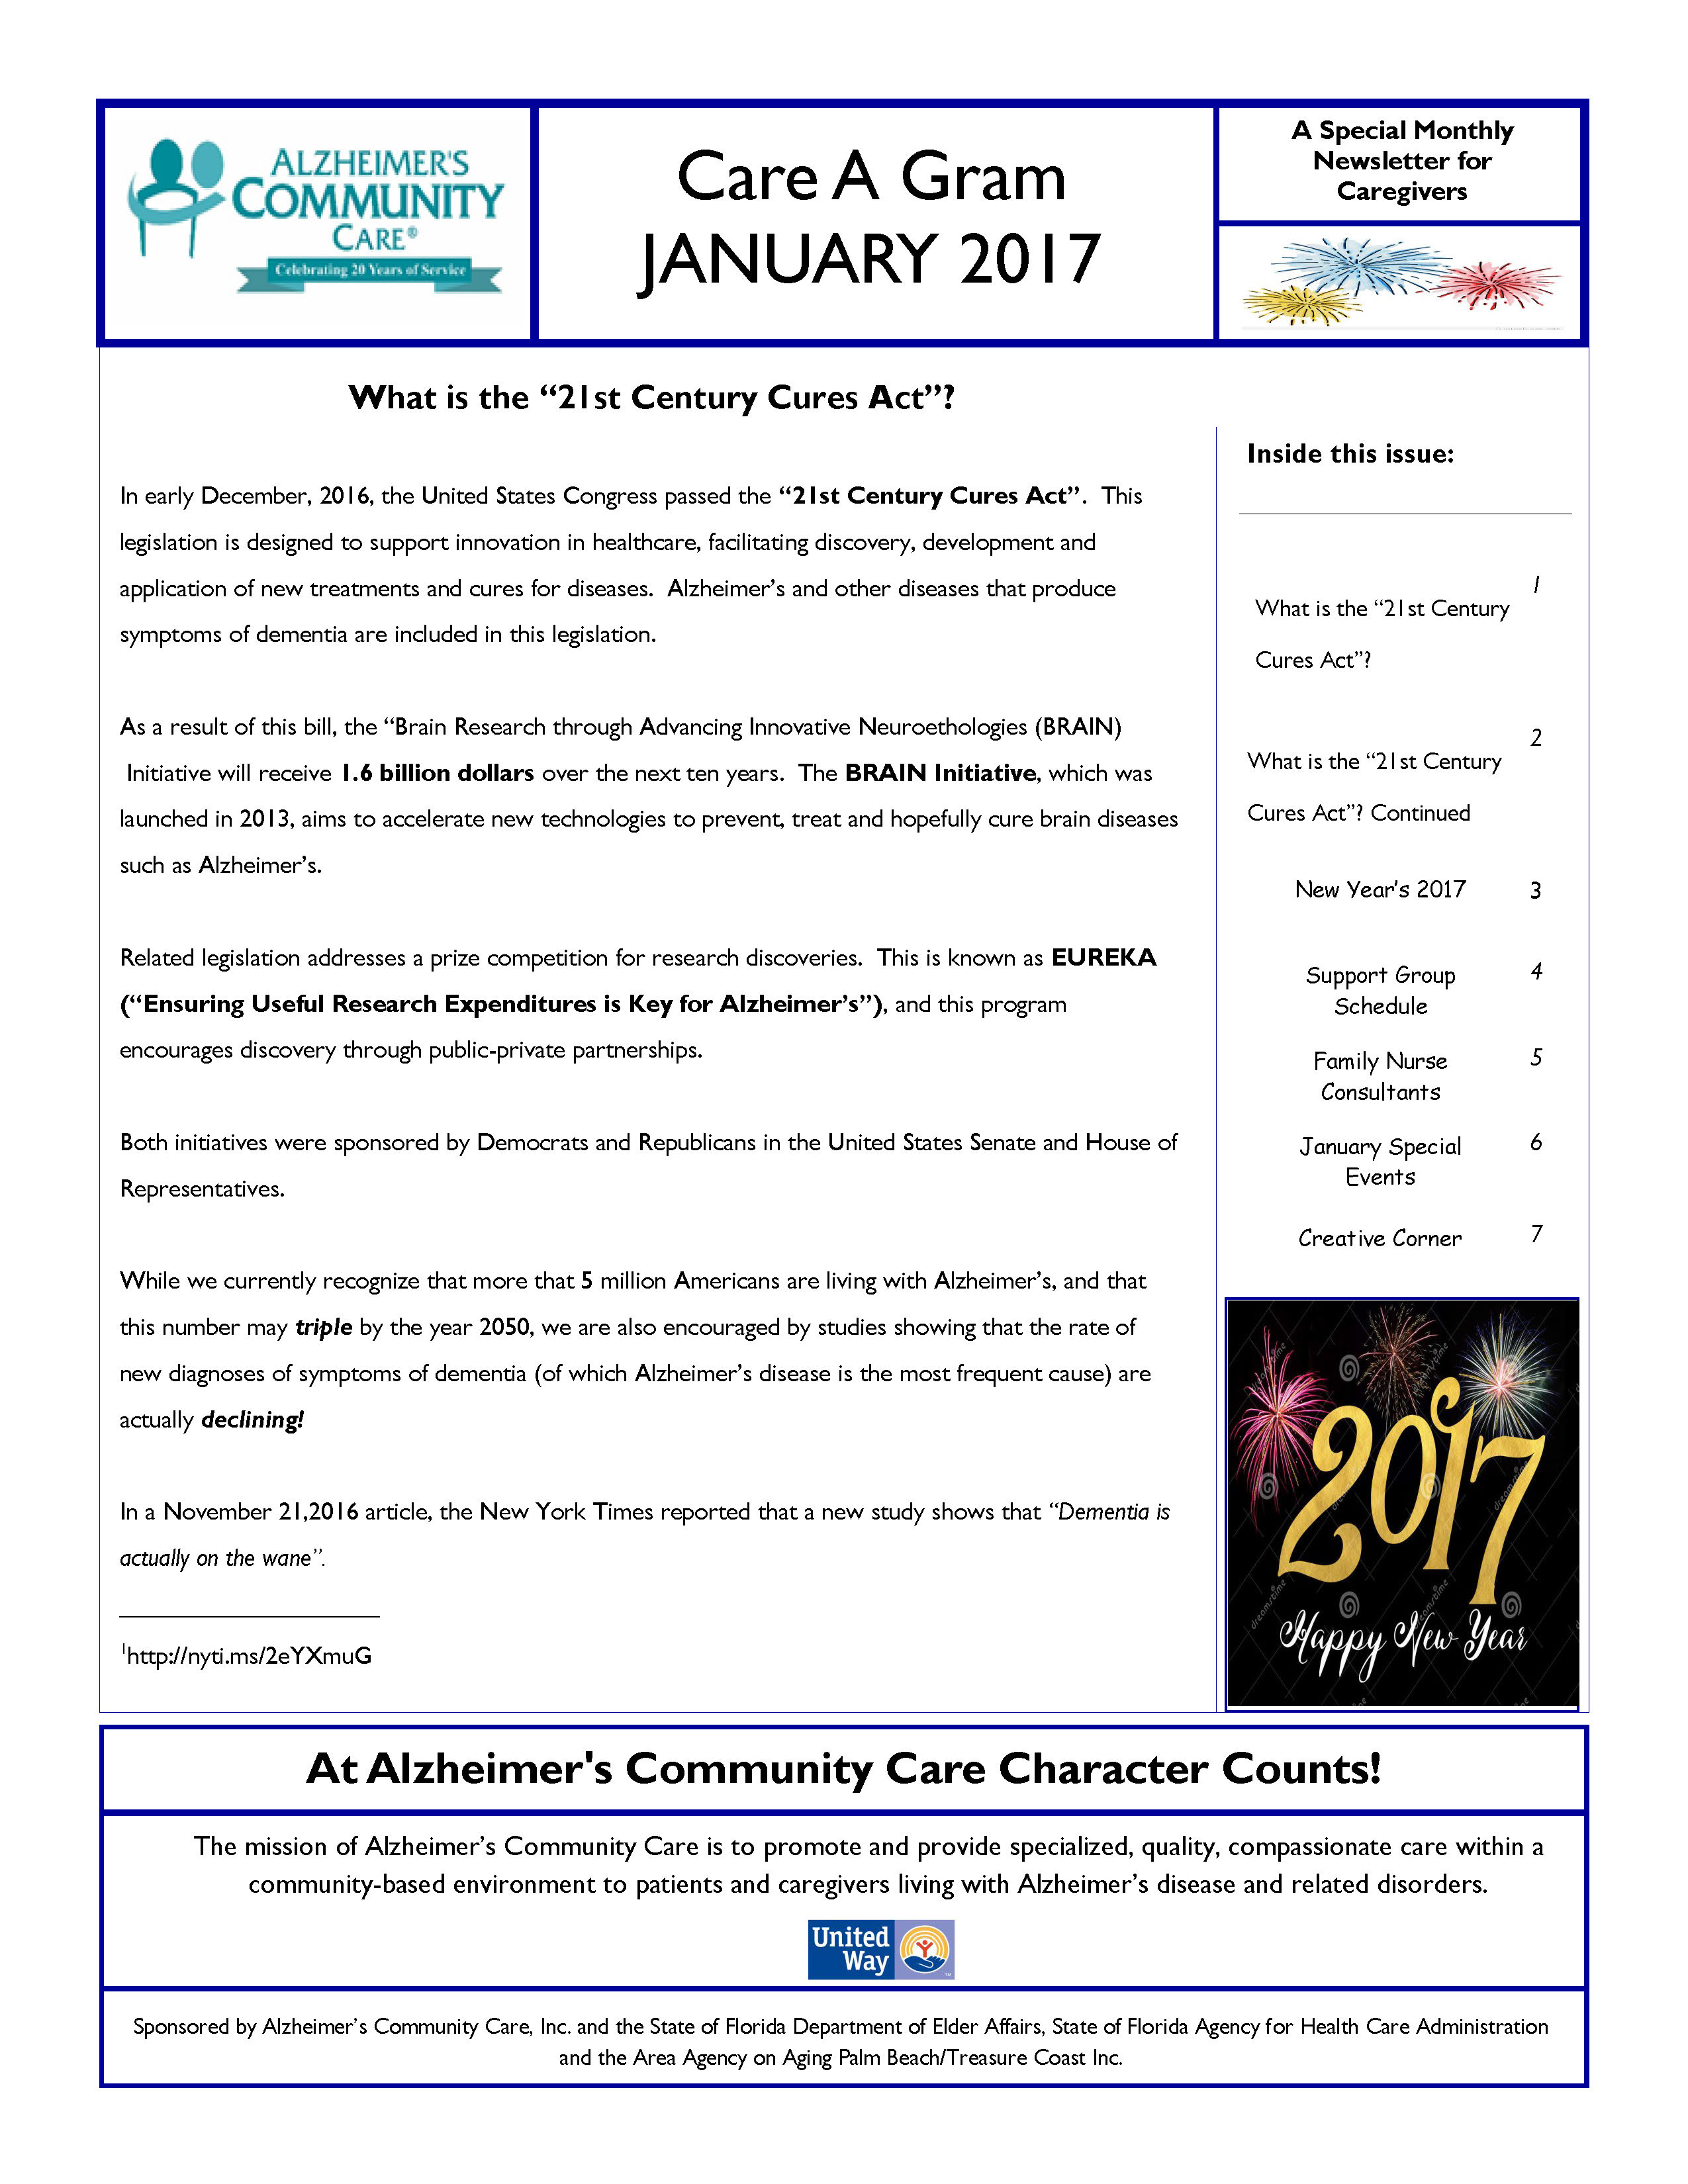 January 2017 Care A Gram